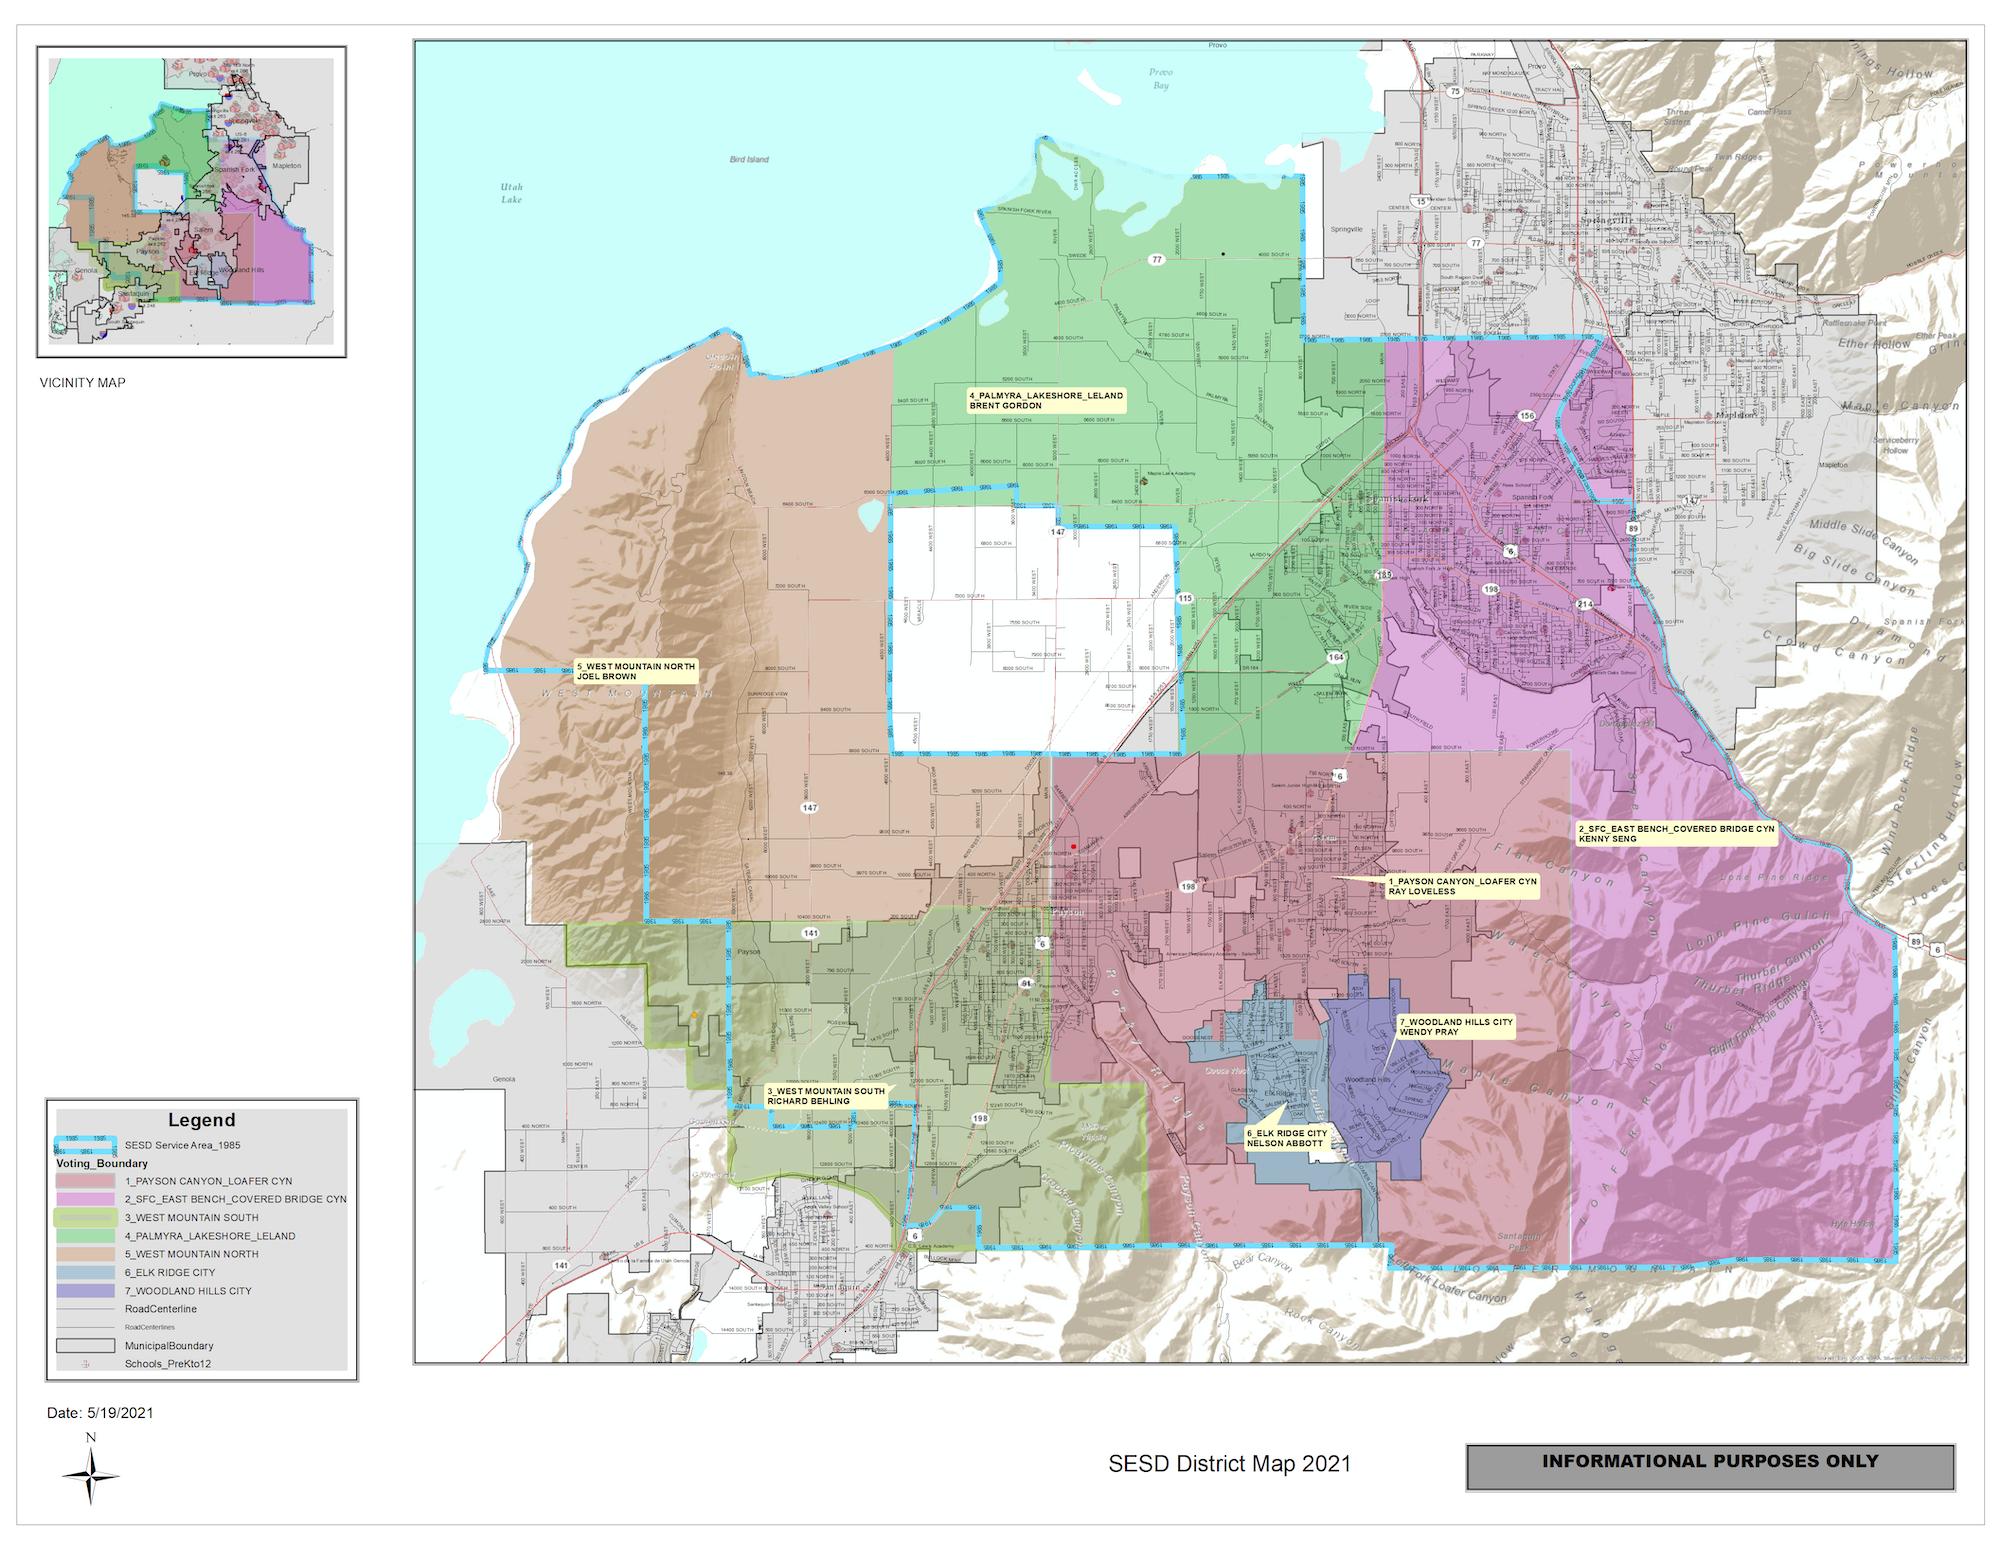 May contain: vegetation, plant, map, diagram, atlas, plot, and bush